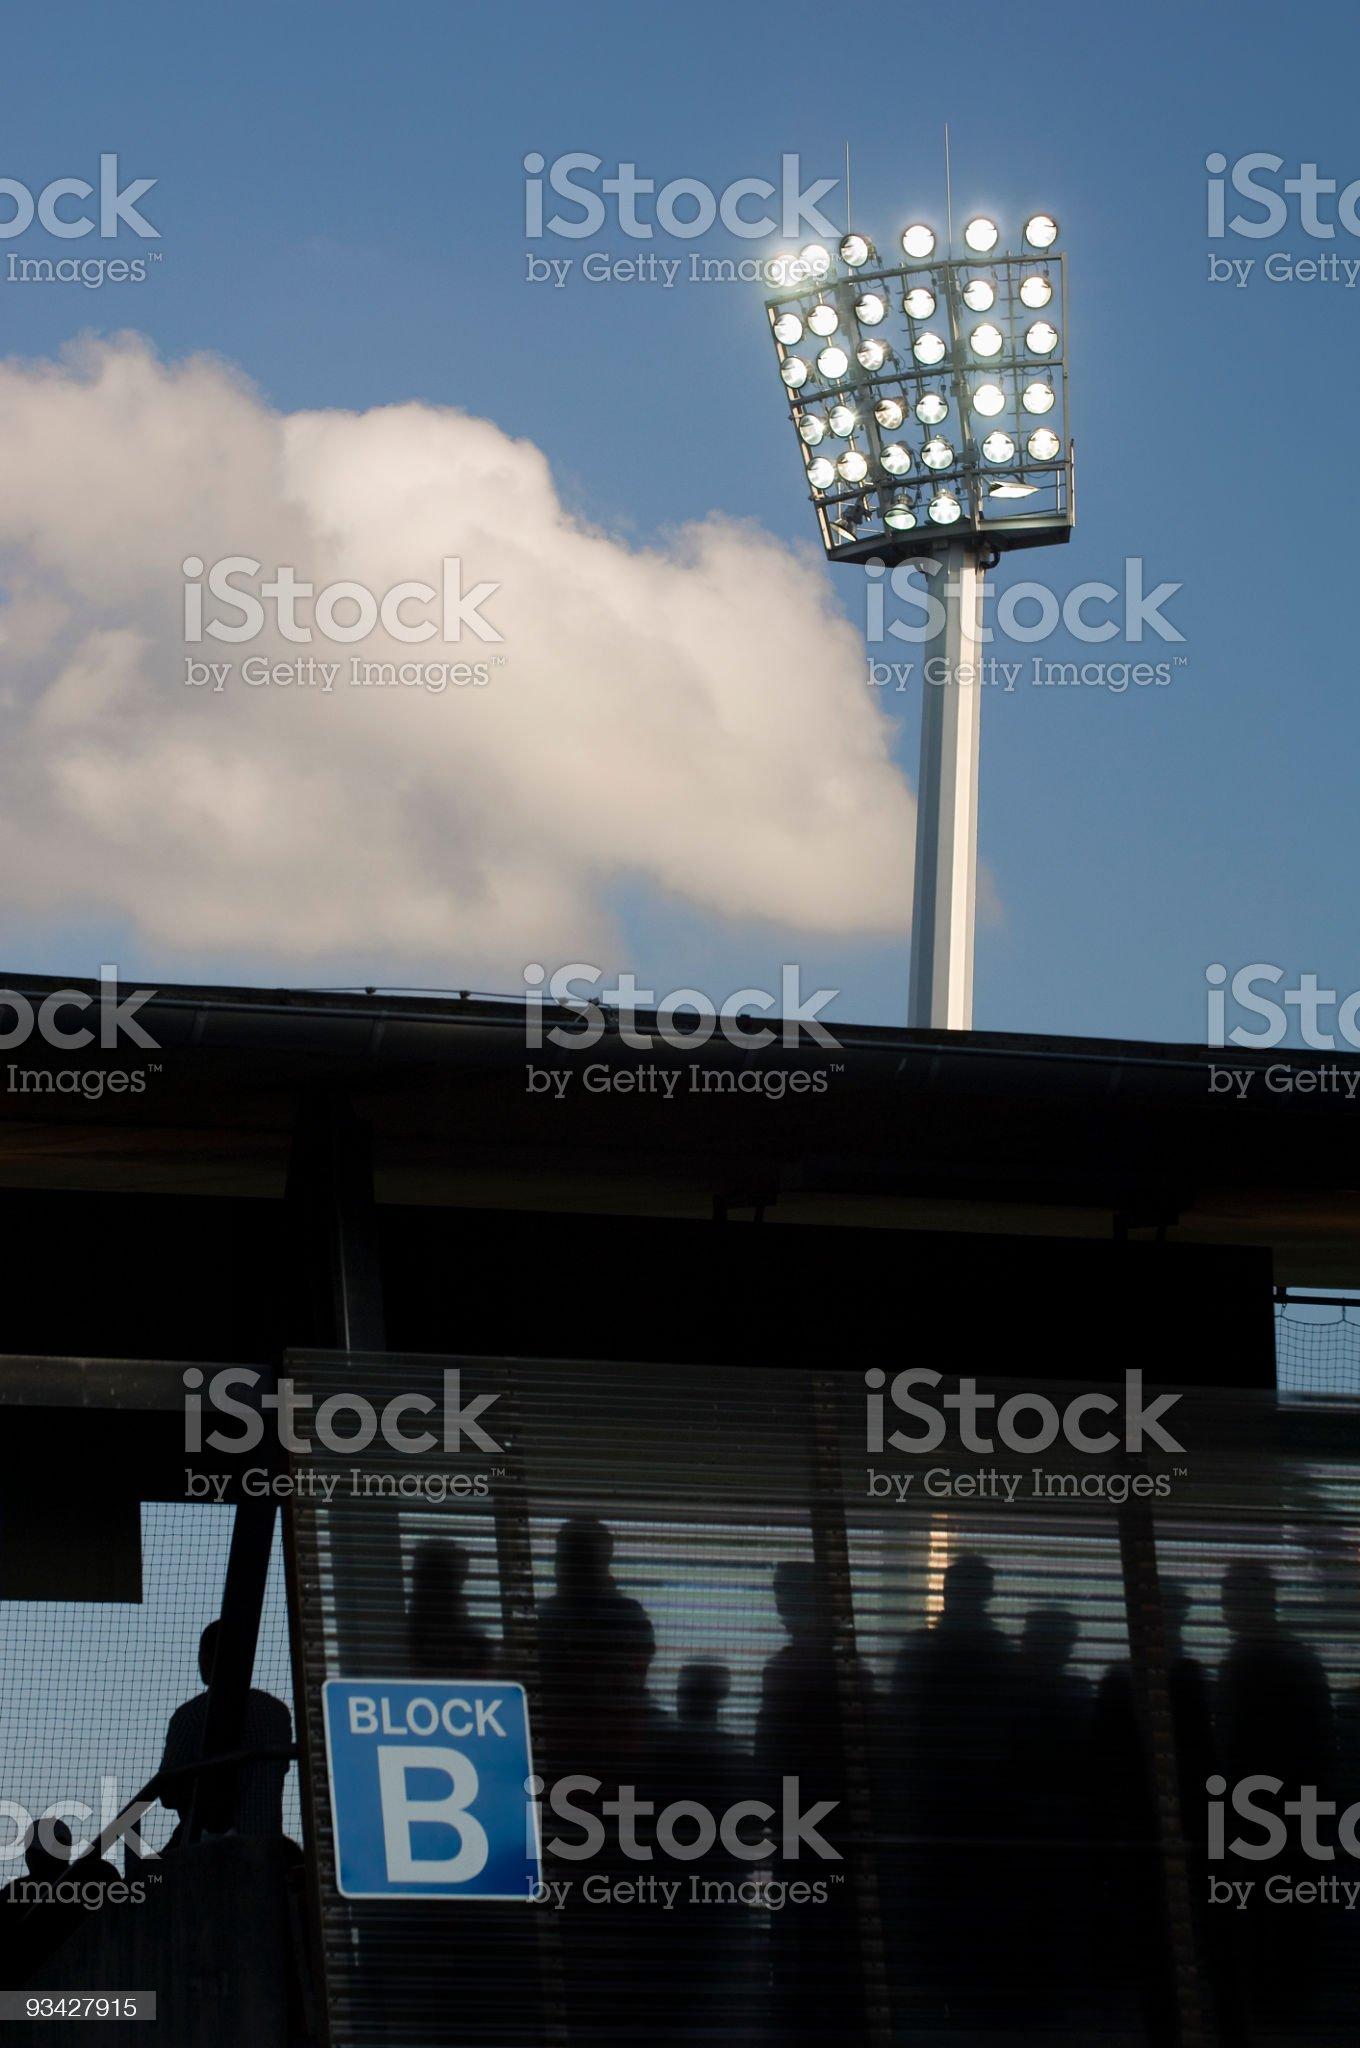 Stadium Block under Floodlight royalty-free stock photo